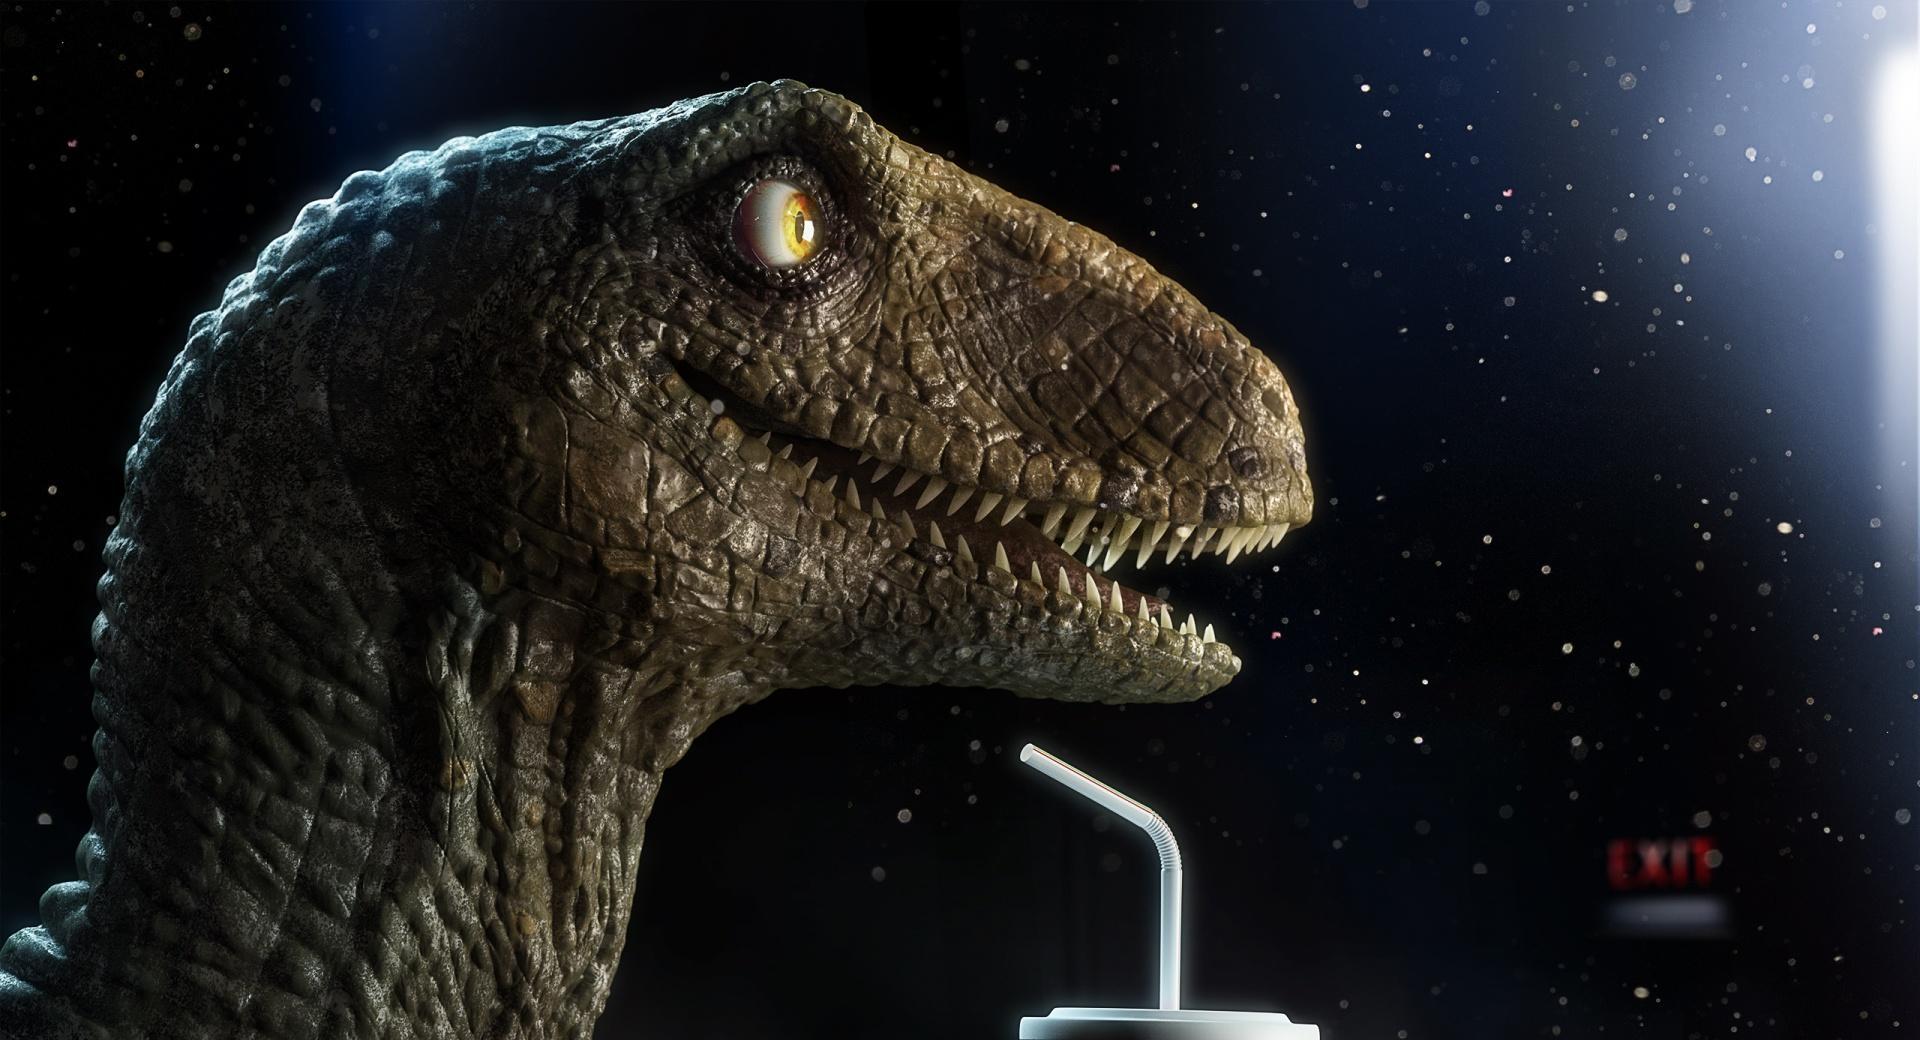 Godzilla Movie 2014 wallpapers HD quality